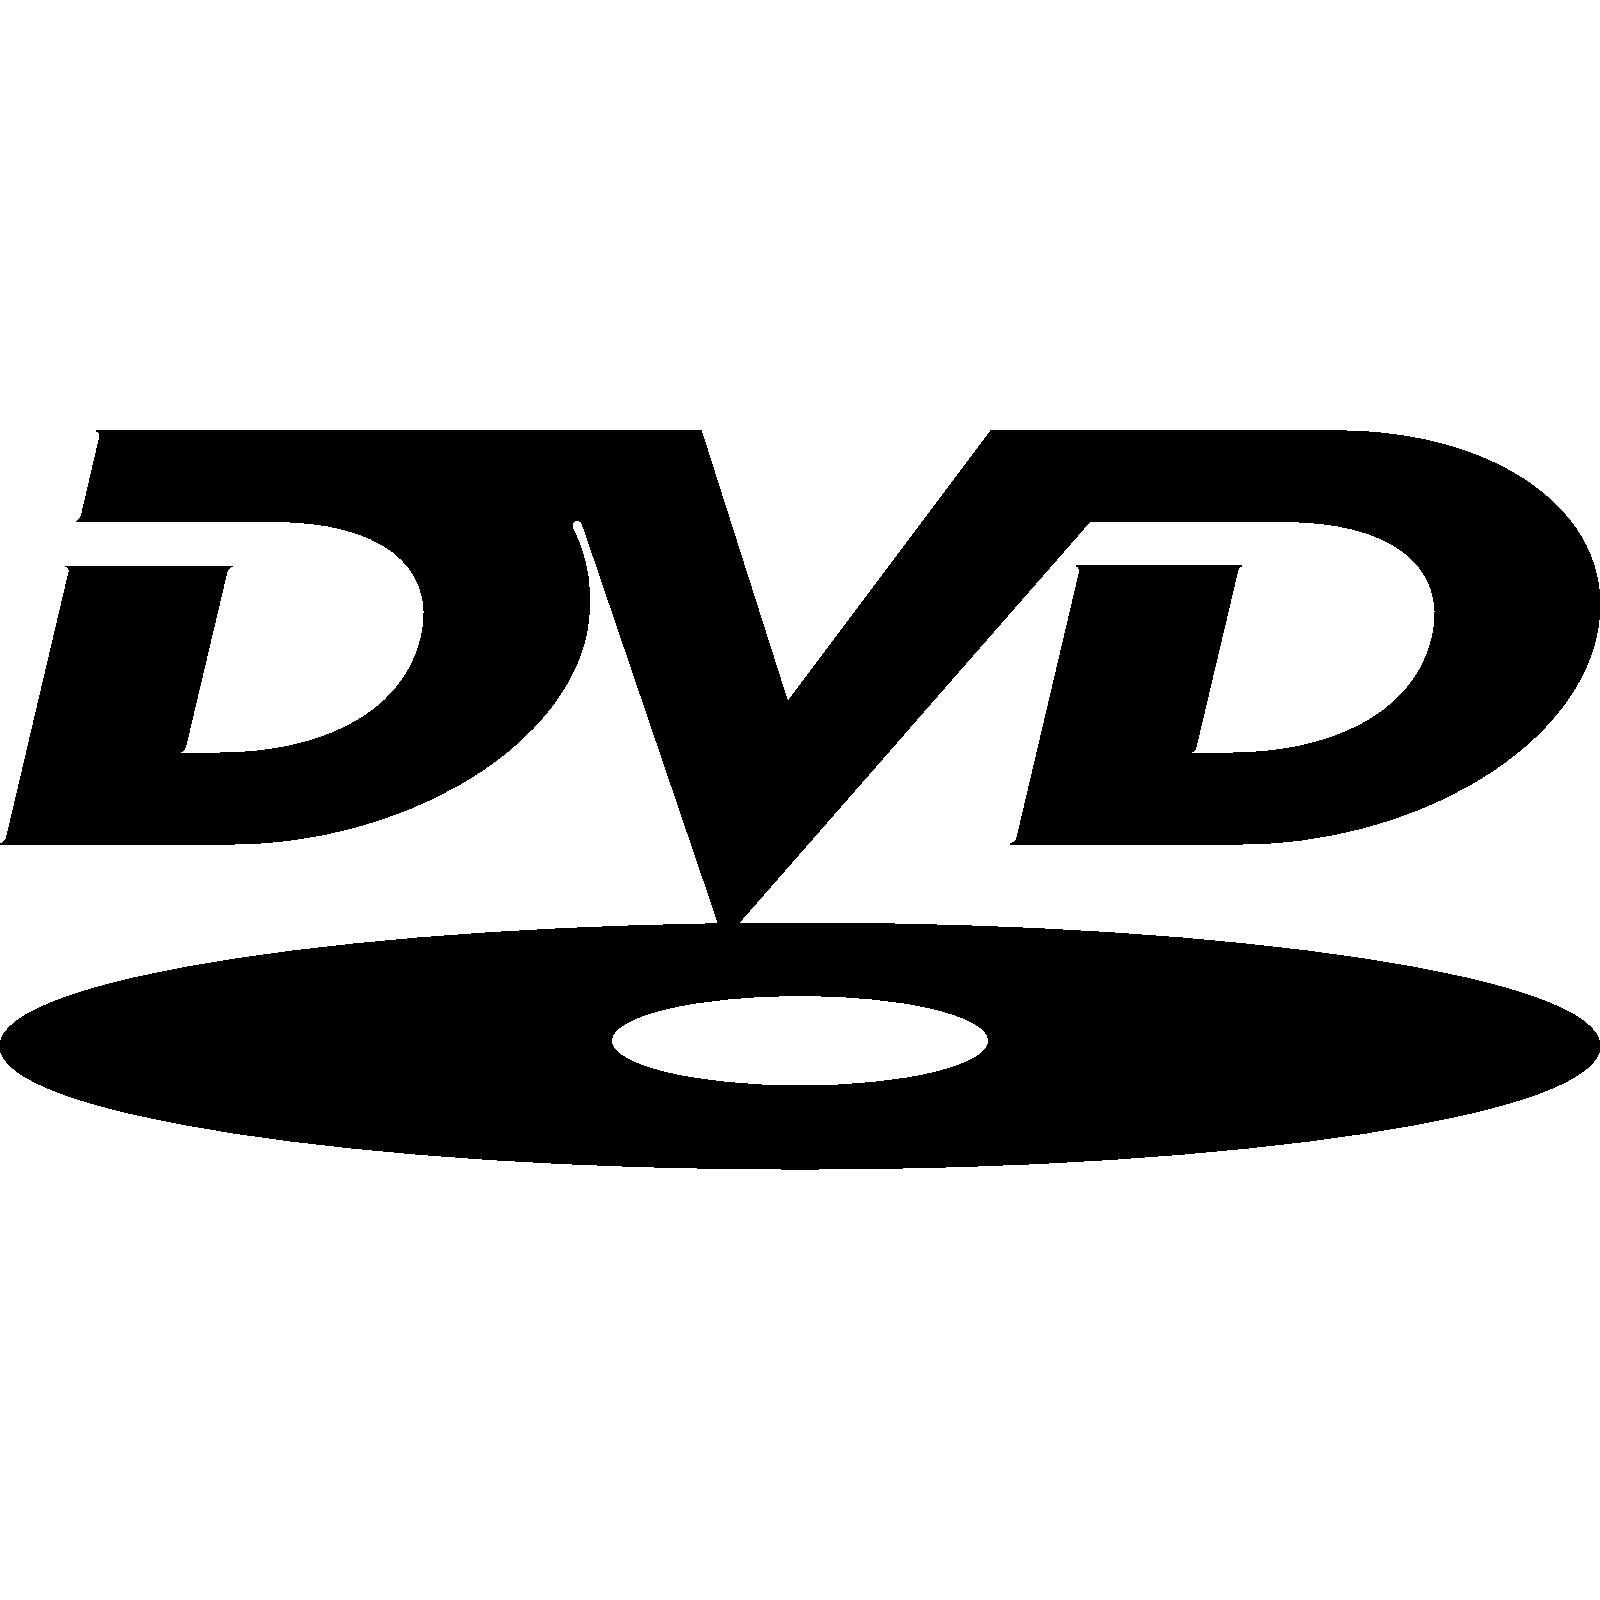 image dvd logo1600 png logopedia fandom powered by wikia rh logos wikia com hd dvd logo png dvd logo blanc png